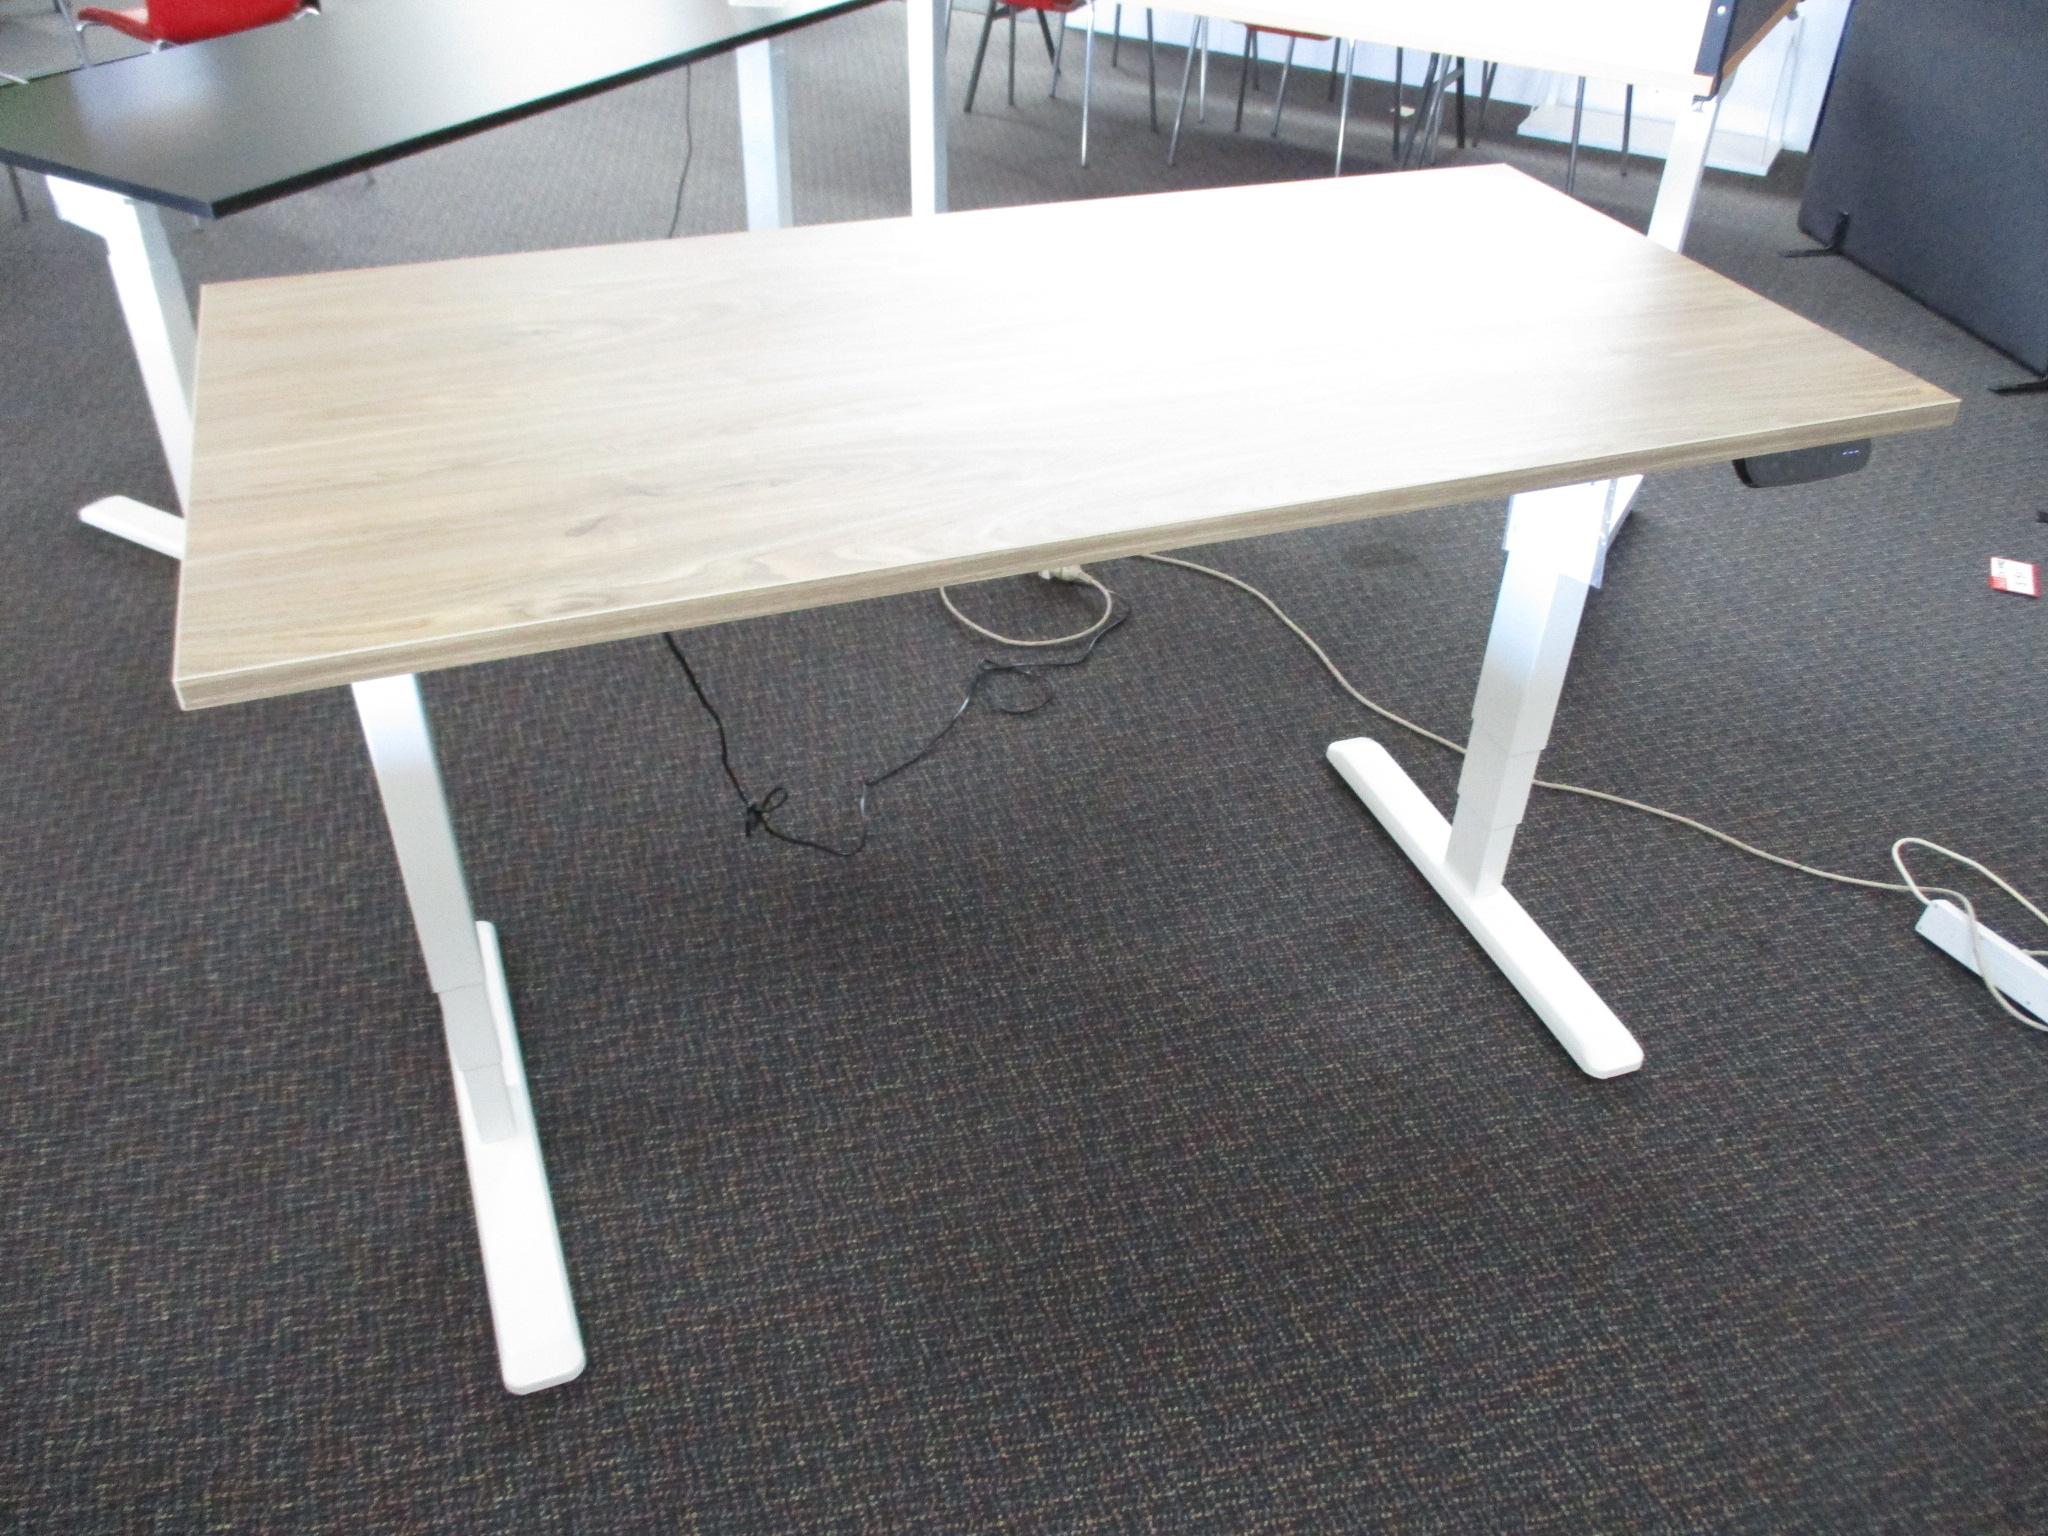 New Electronic Height Adjustable Desk 1500×750 $860